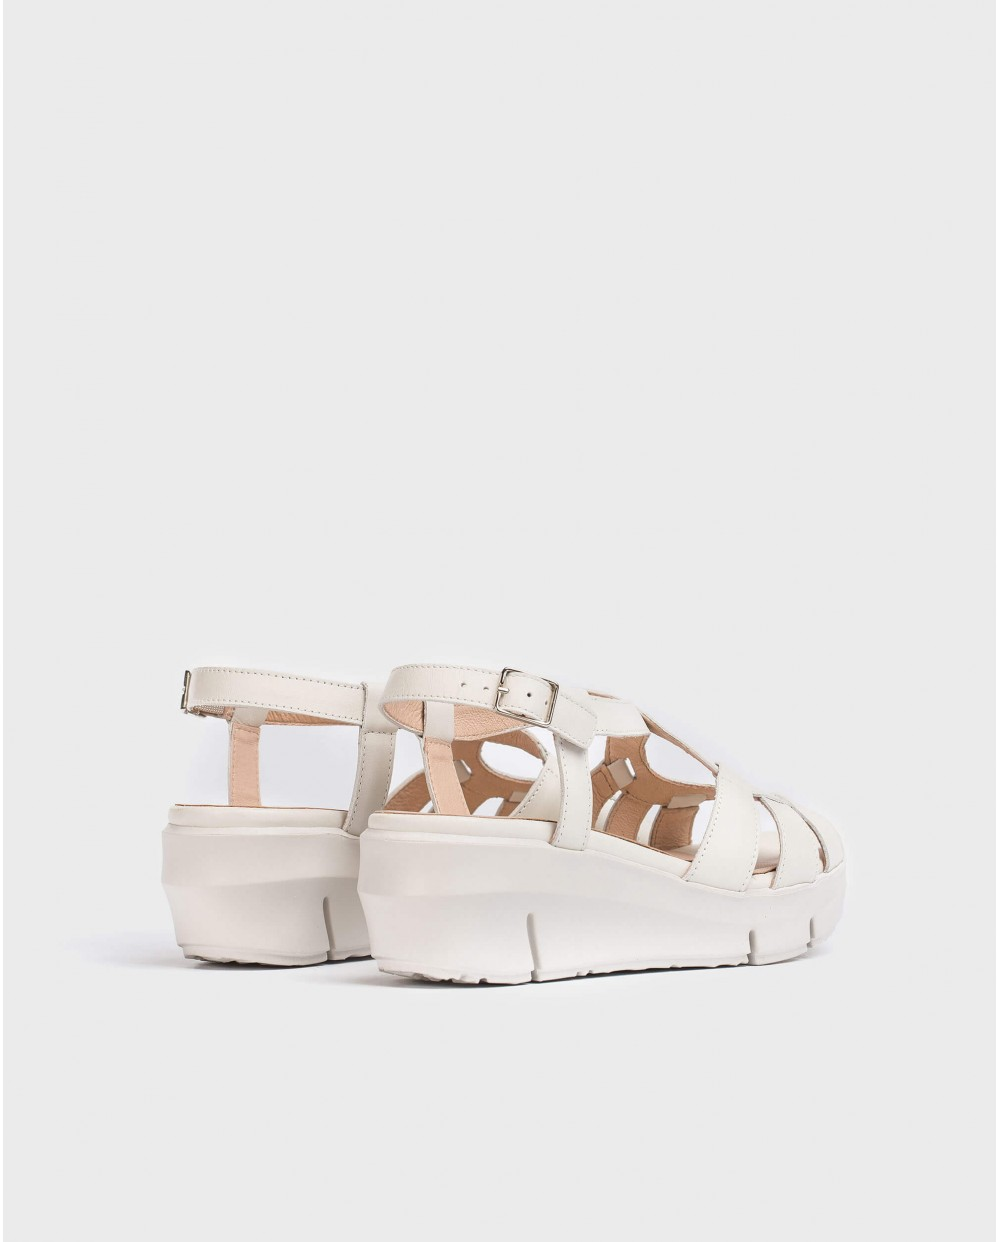 Wonders-Sandals-Sandal with criss-cross strap